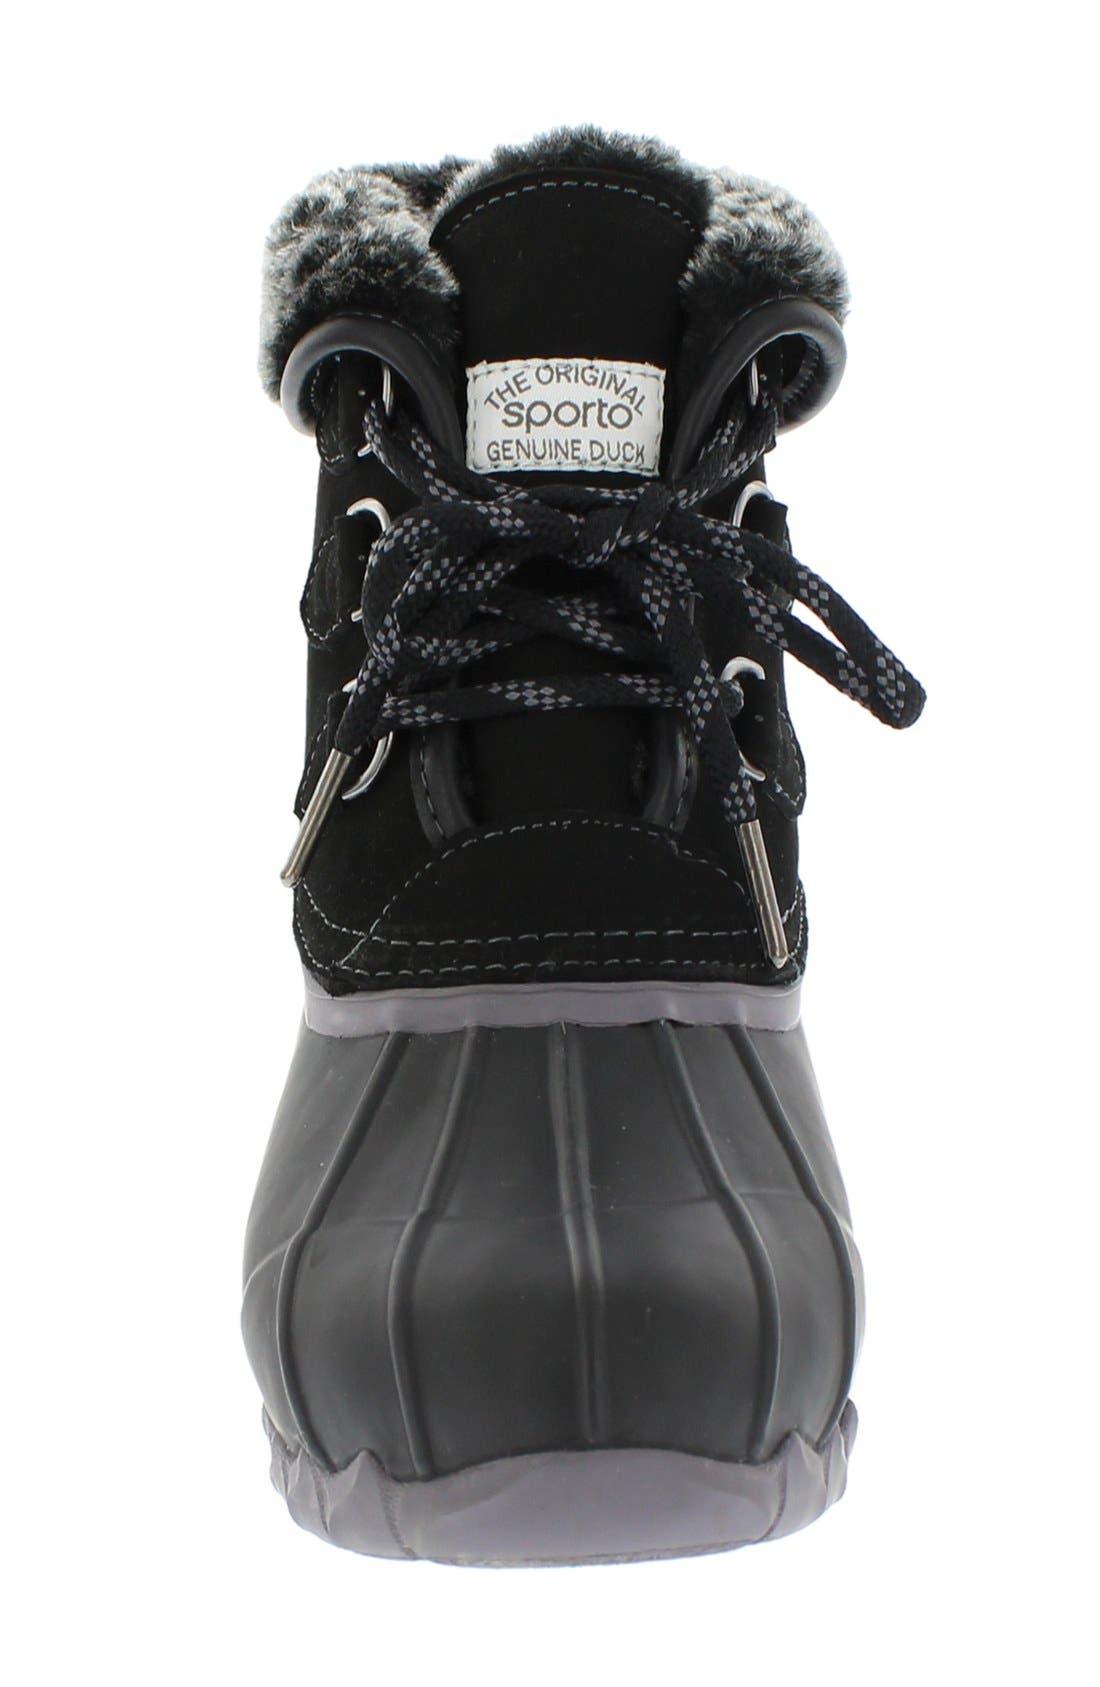 Defrost Faux Fur Lined Duck Boot,                             Alternate thumbnail 3, color,                             Black/ Black